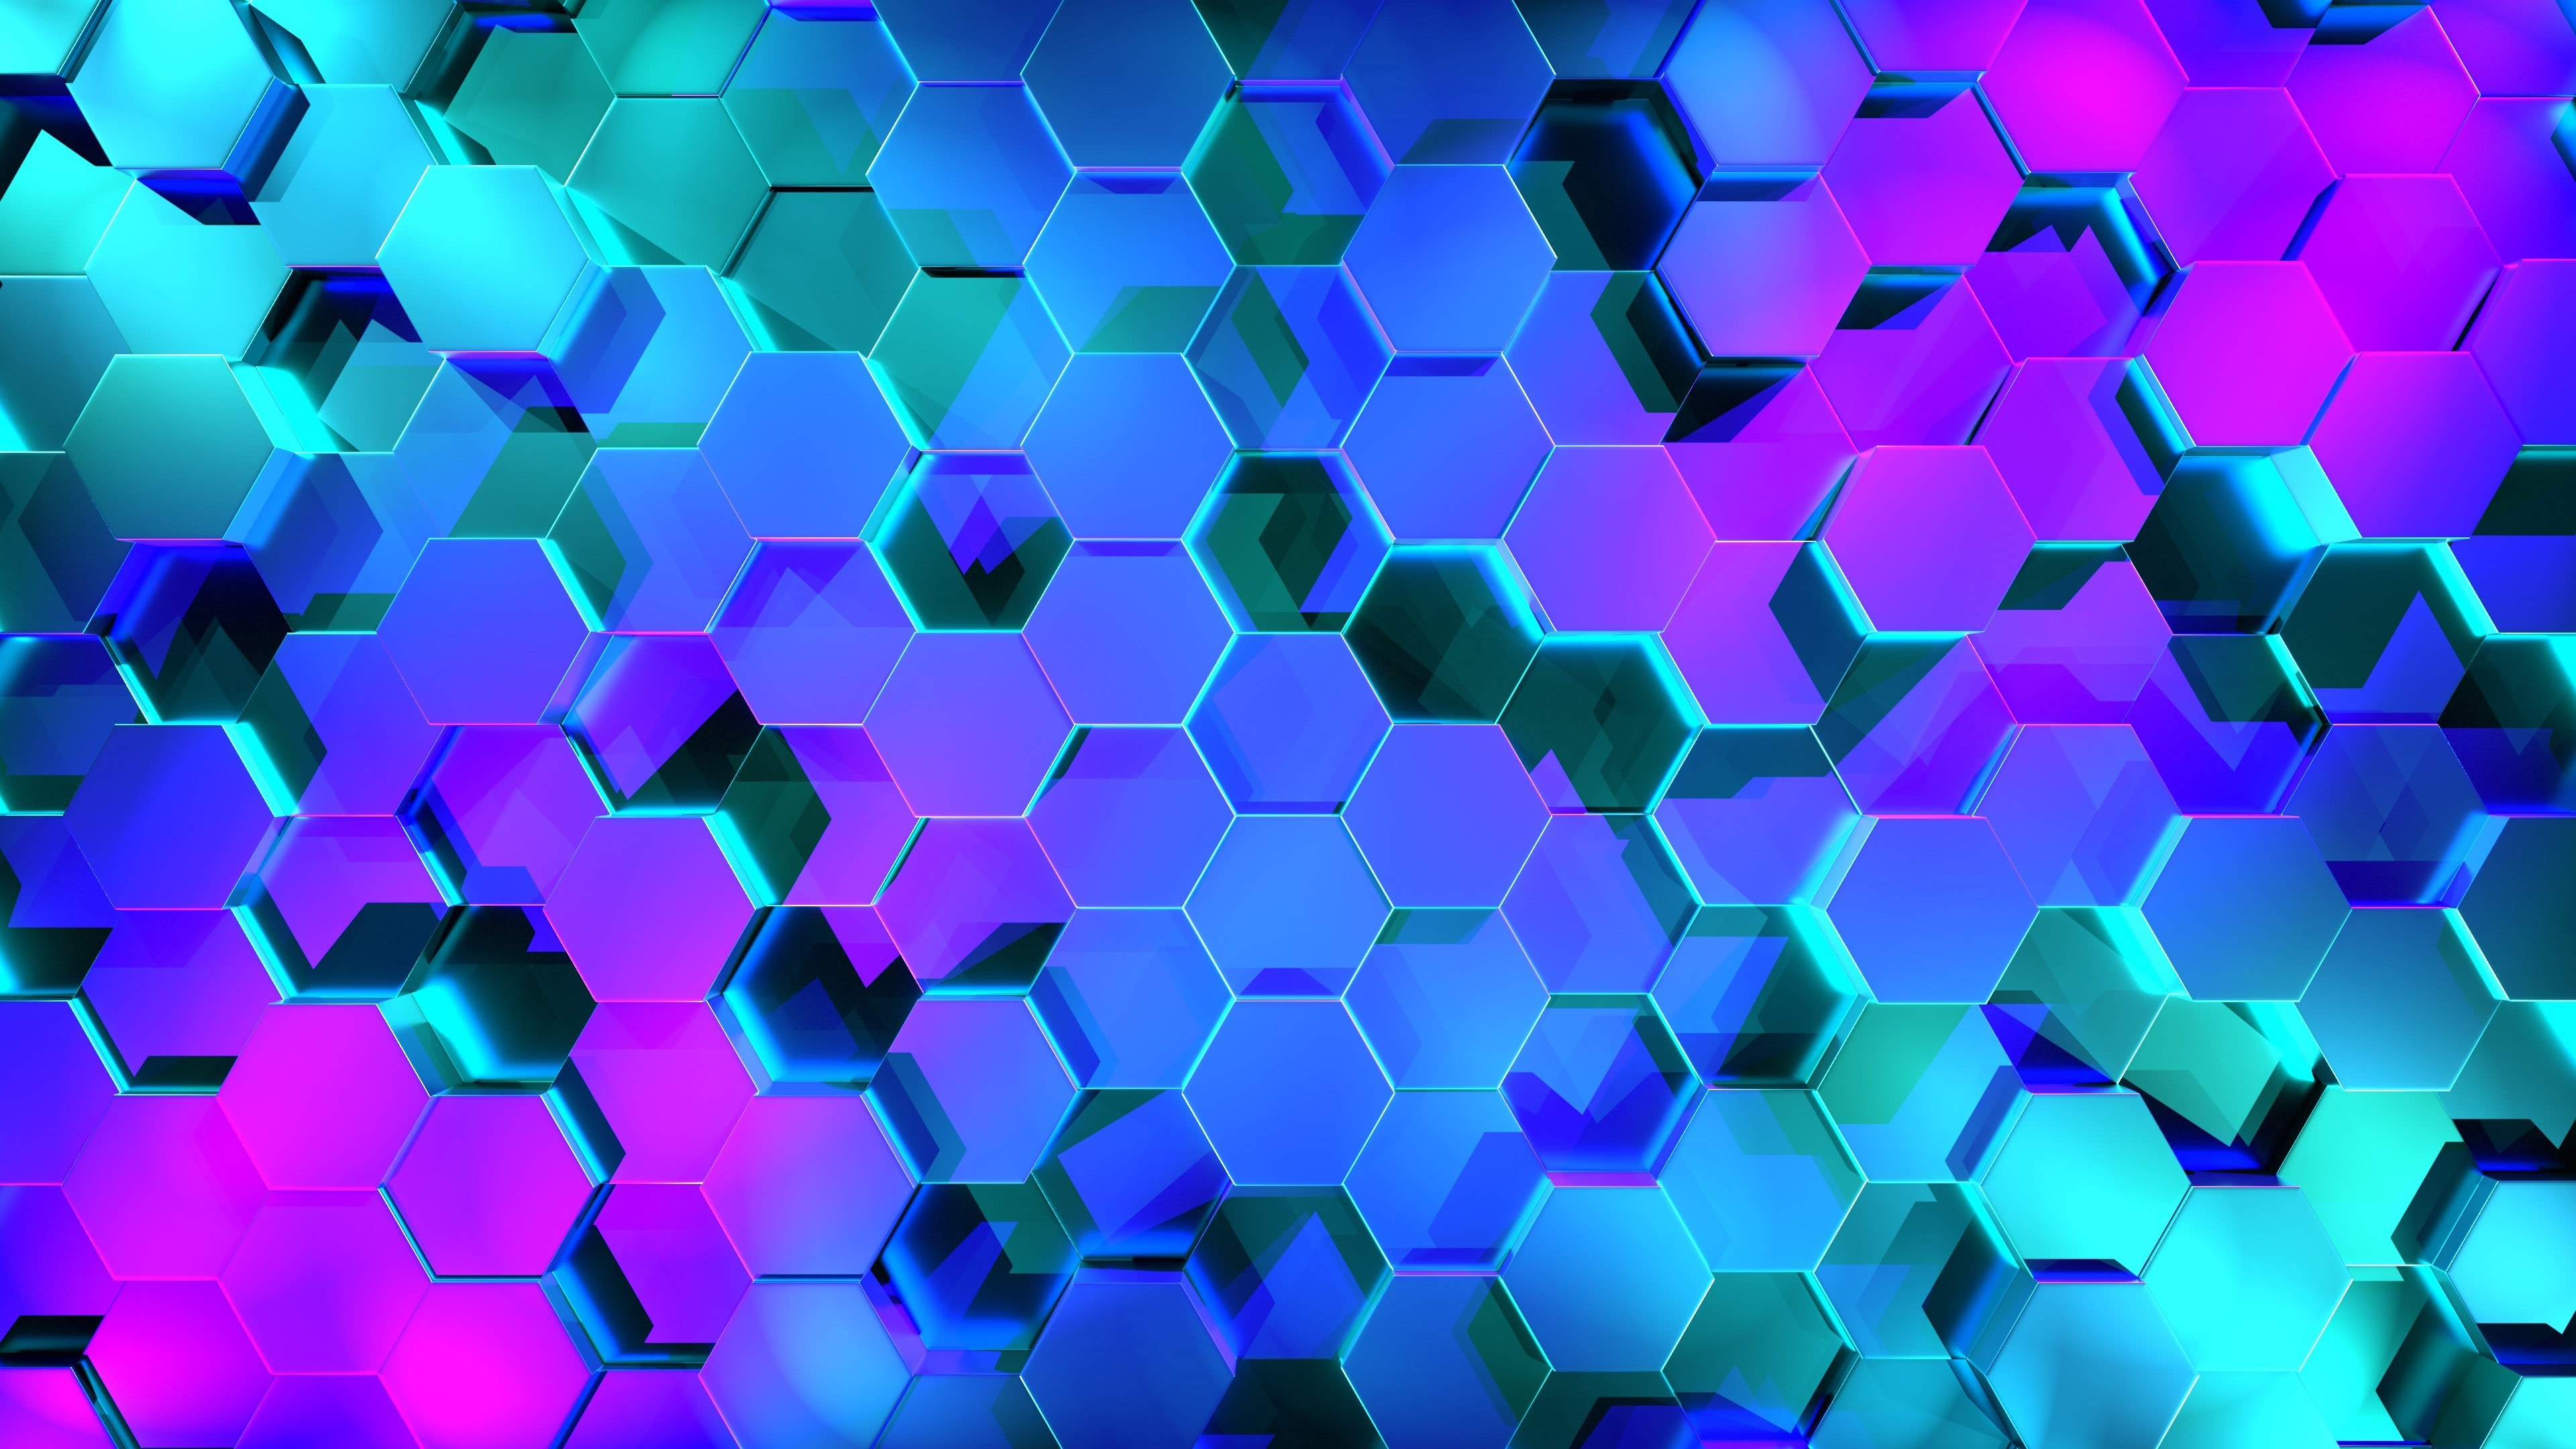 Download Wallpaper Hexagons Rendering Light Shape Within